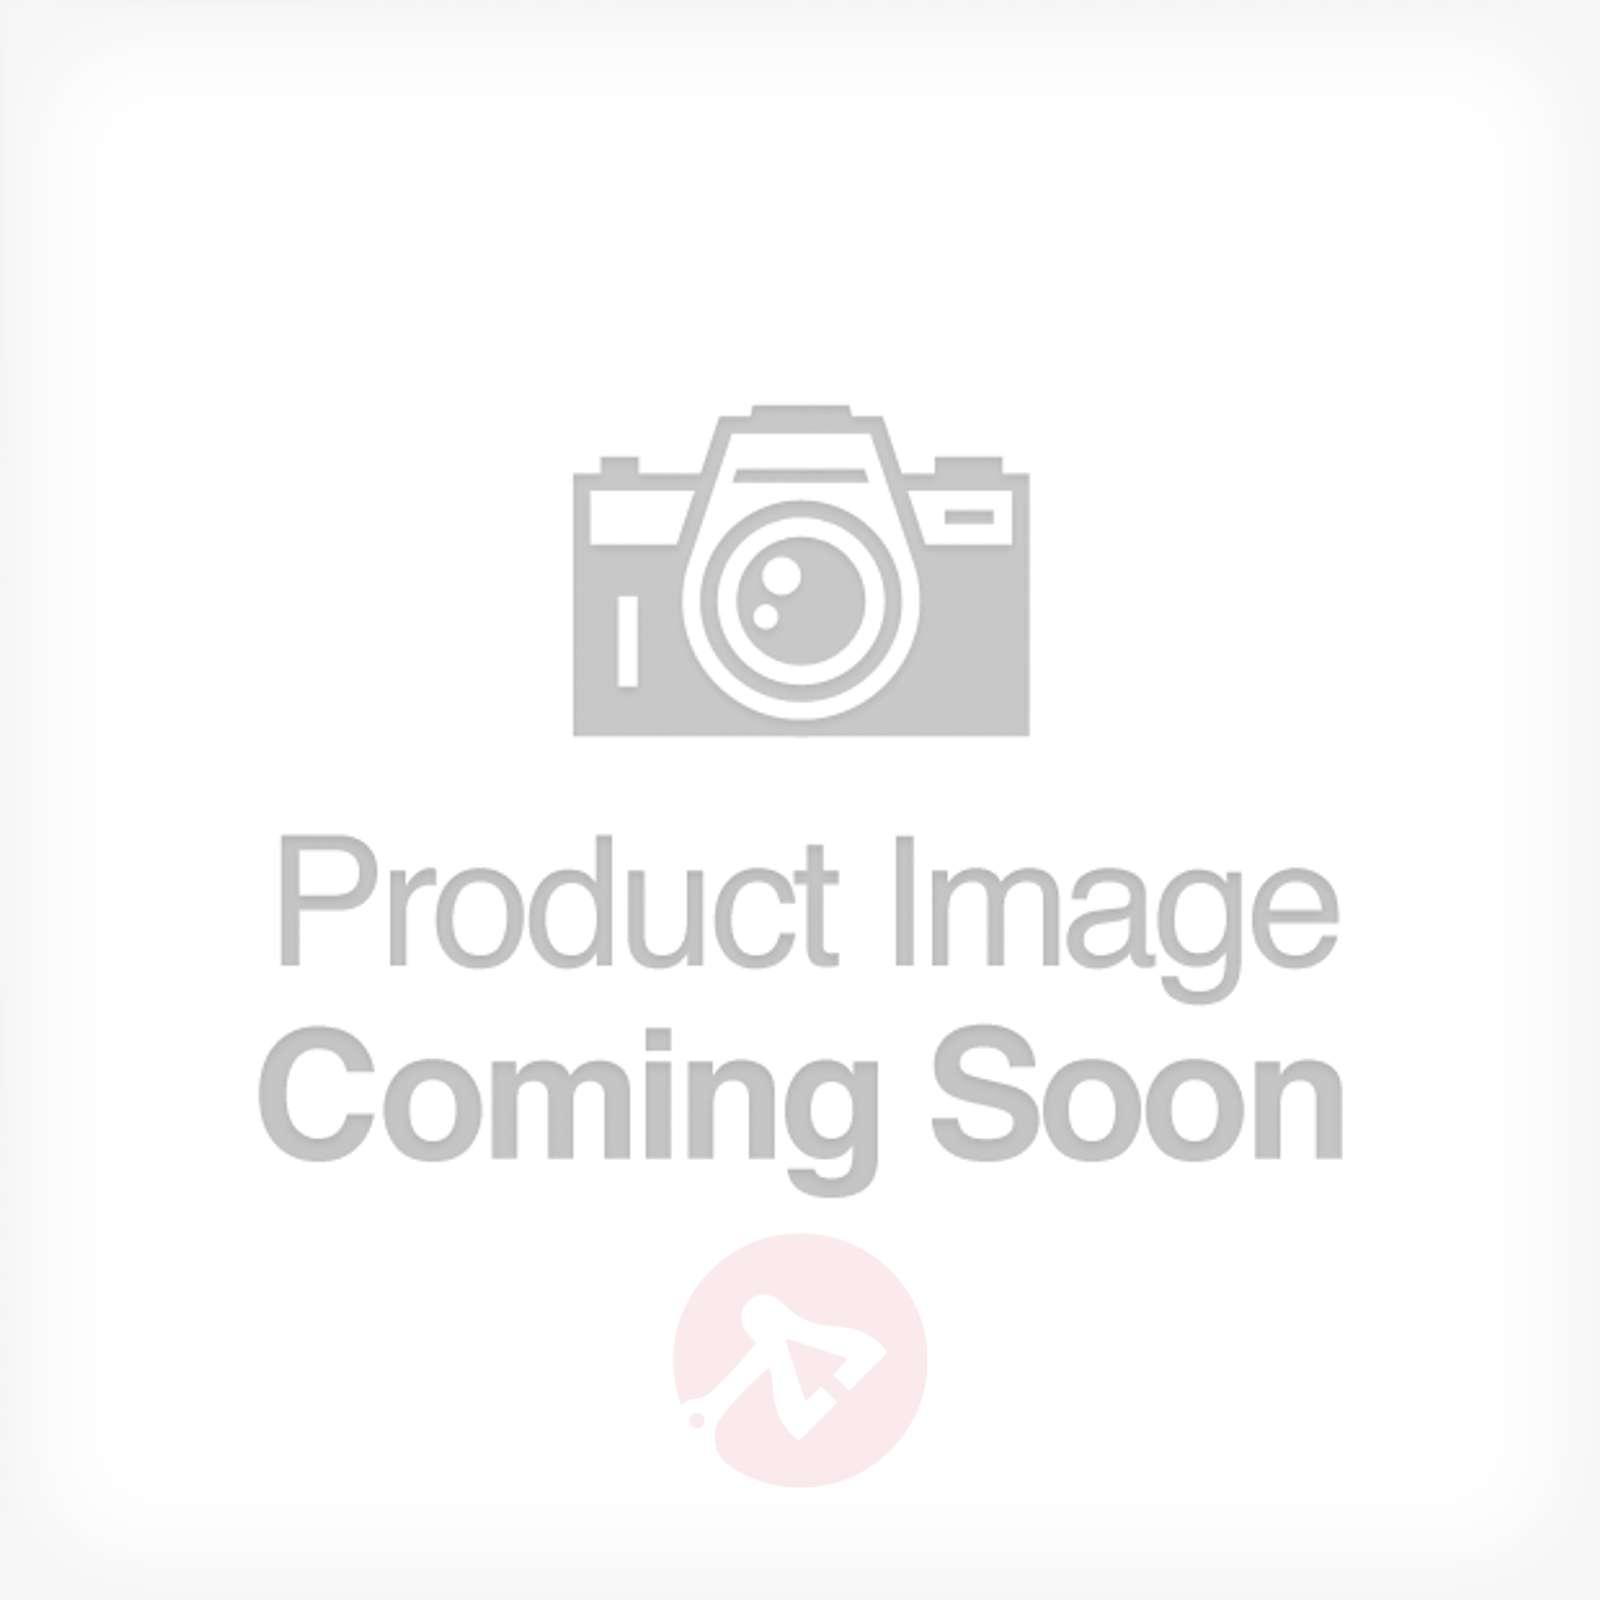 Anglepoise Type 75 Mini table lamp Paul Smith-1073013X-03